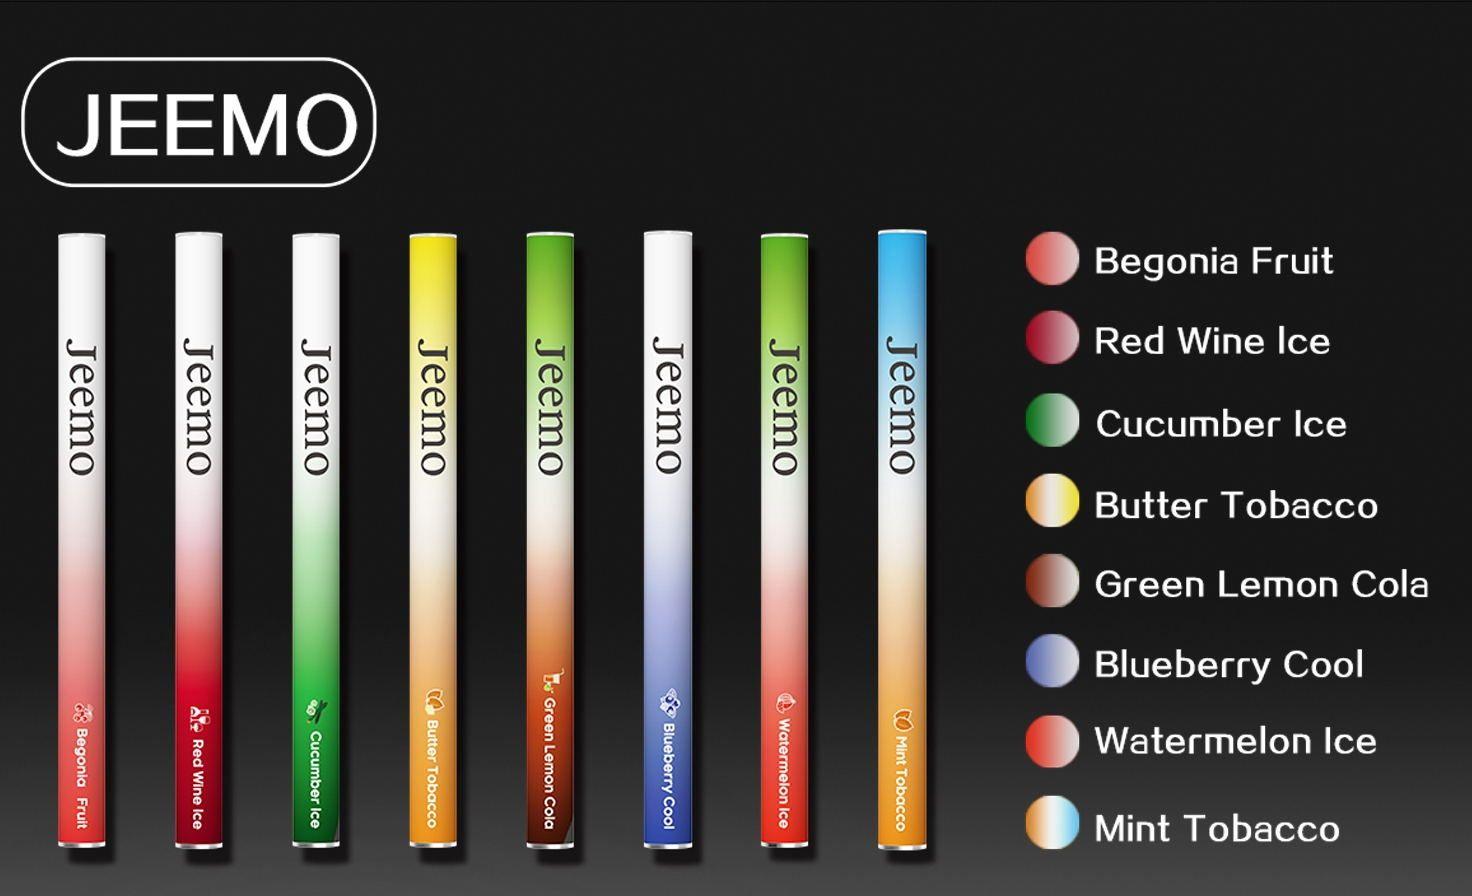 Jeemo Dispoable Nicotine Pods - 5pc Box